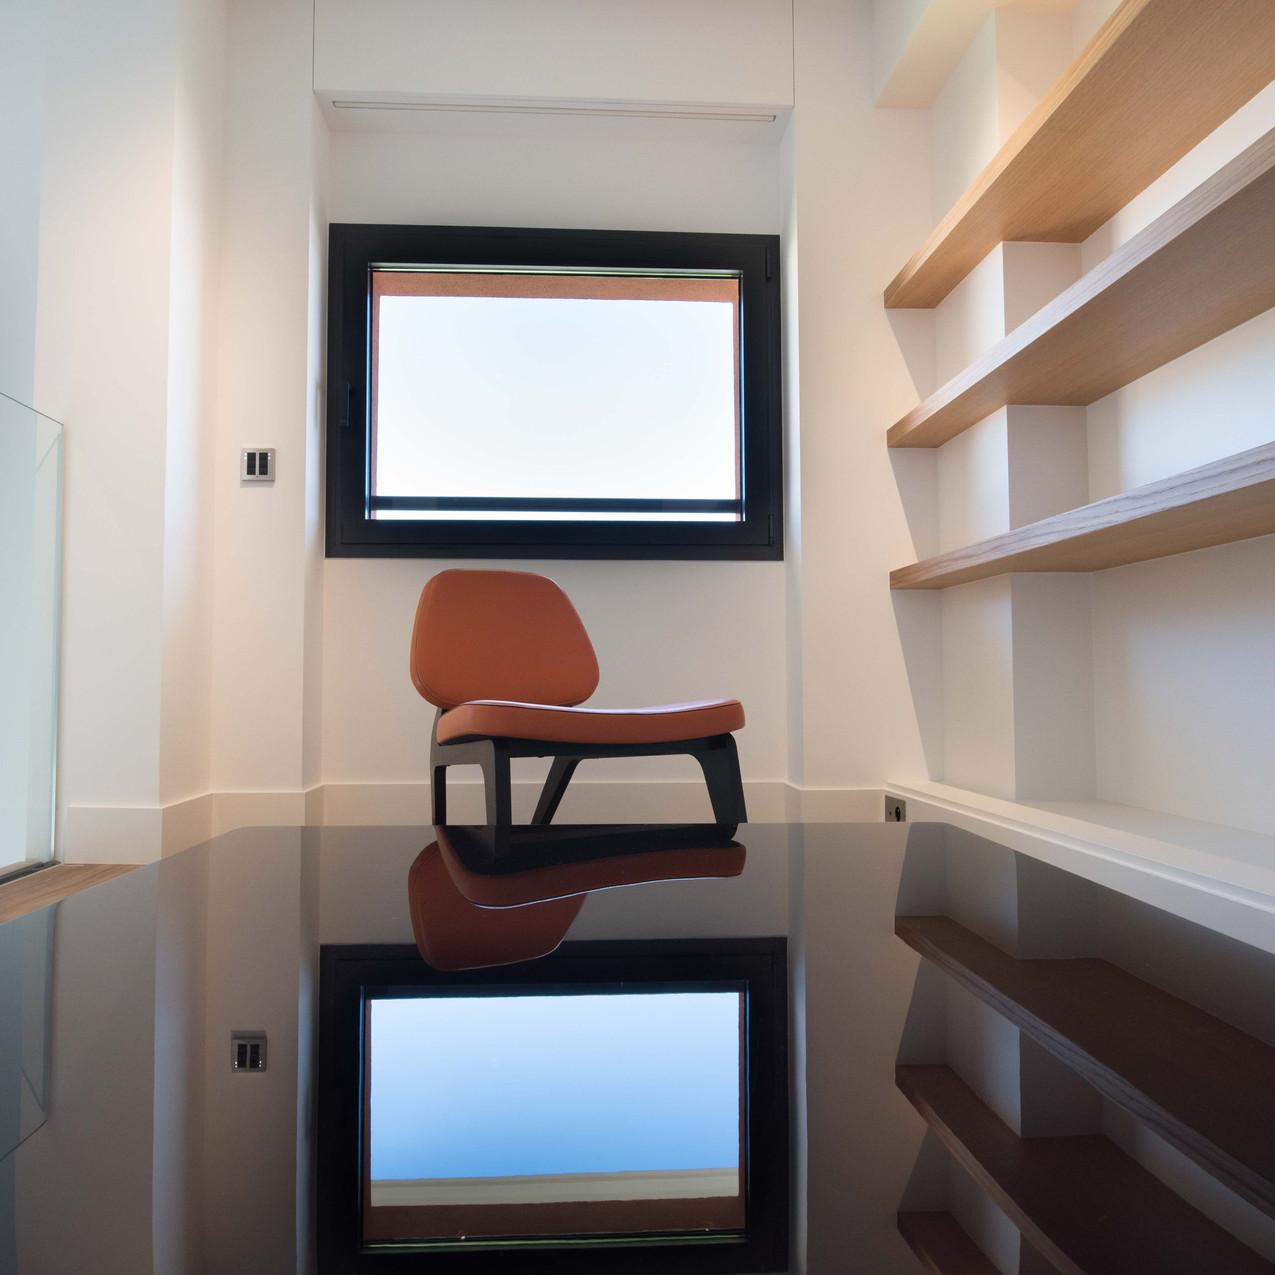 photographe architecture nice france french riviera paca cote dazur interieur-40